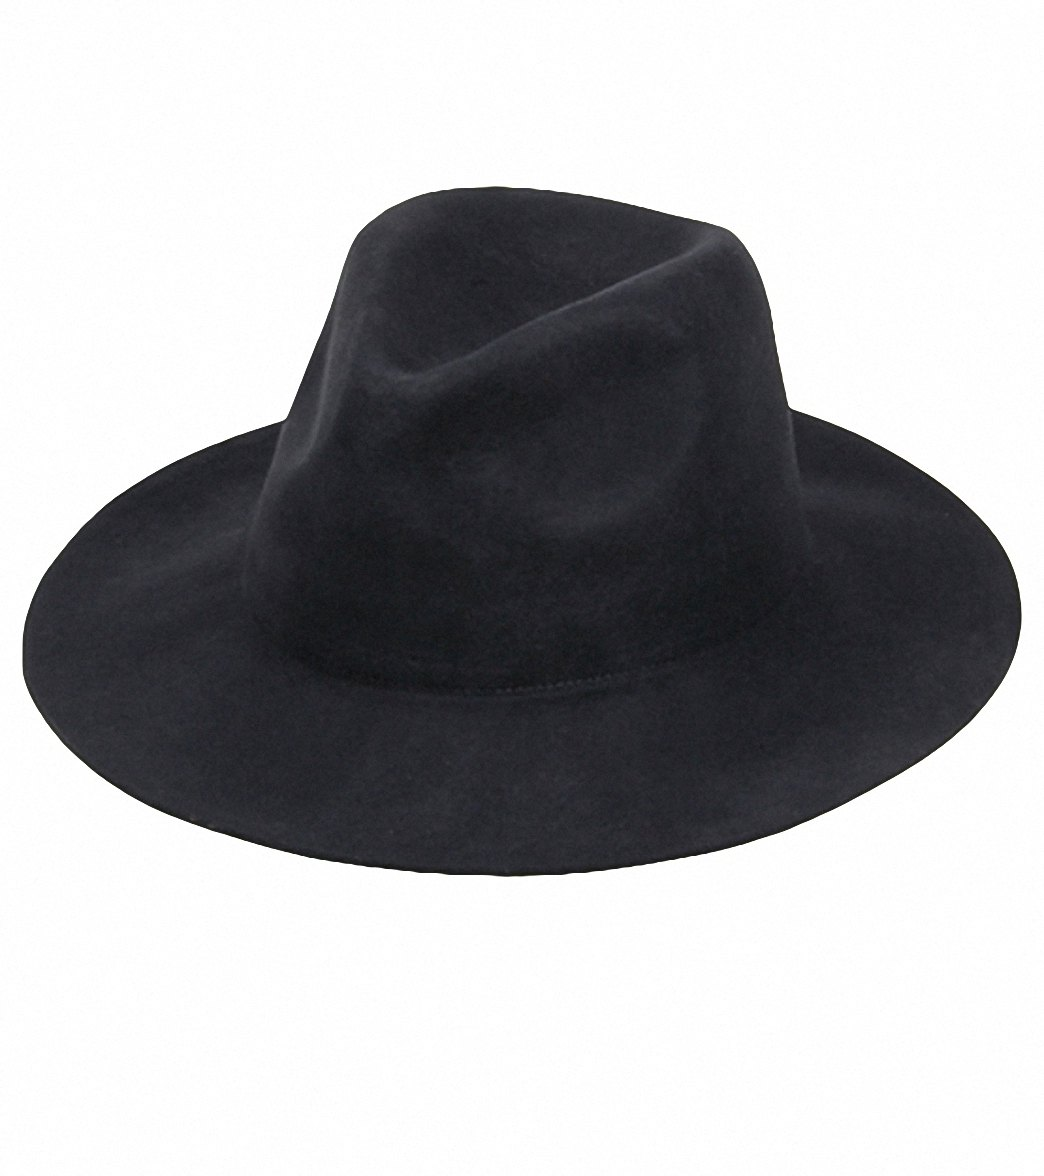 Rhythm Men s The Pocket Hat at SwimOutlet.com 68b069fd067